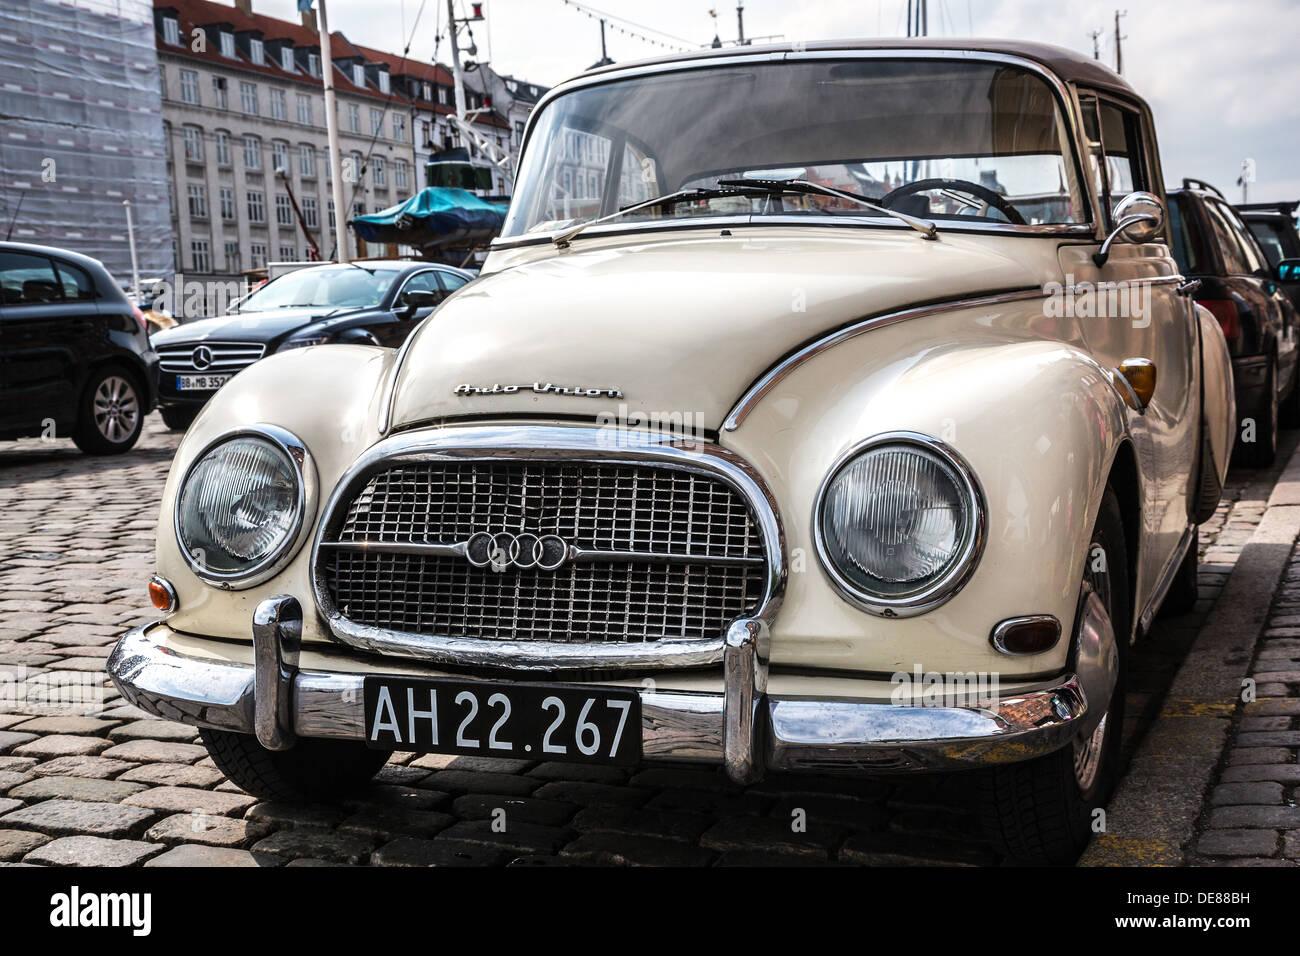 copenhagen denmark a classic car auto union 1000 s coupe stock